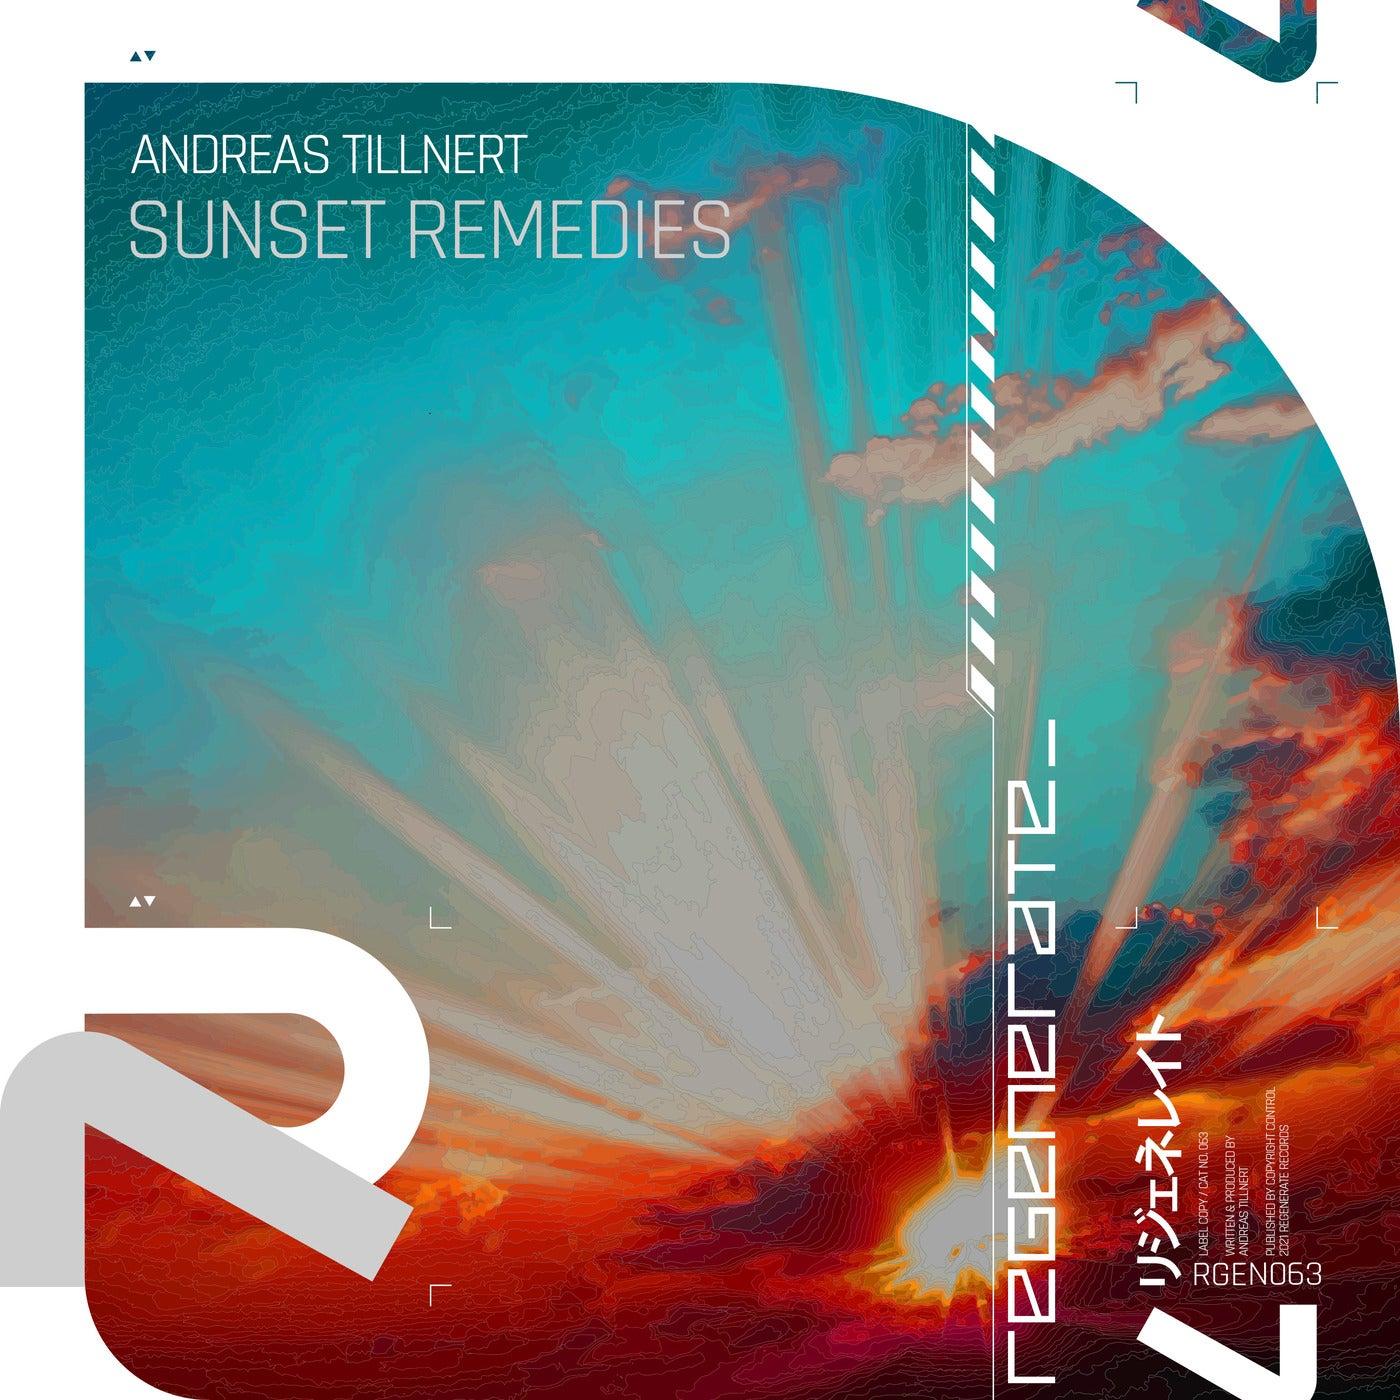 Sunset Remedies